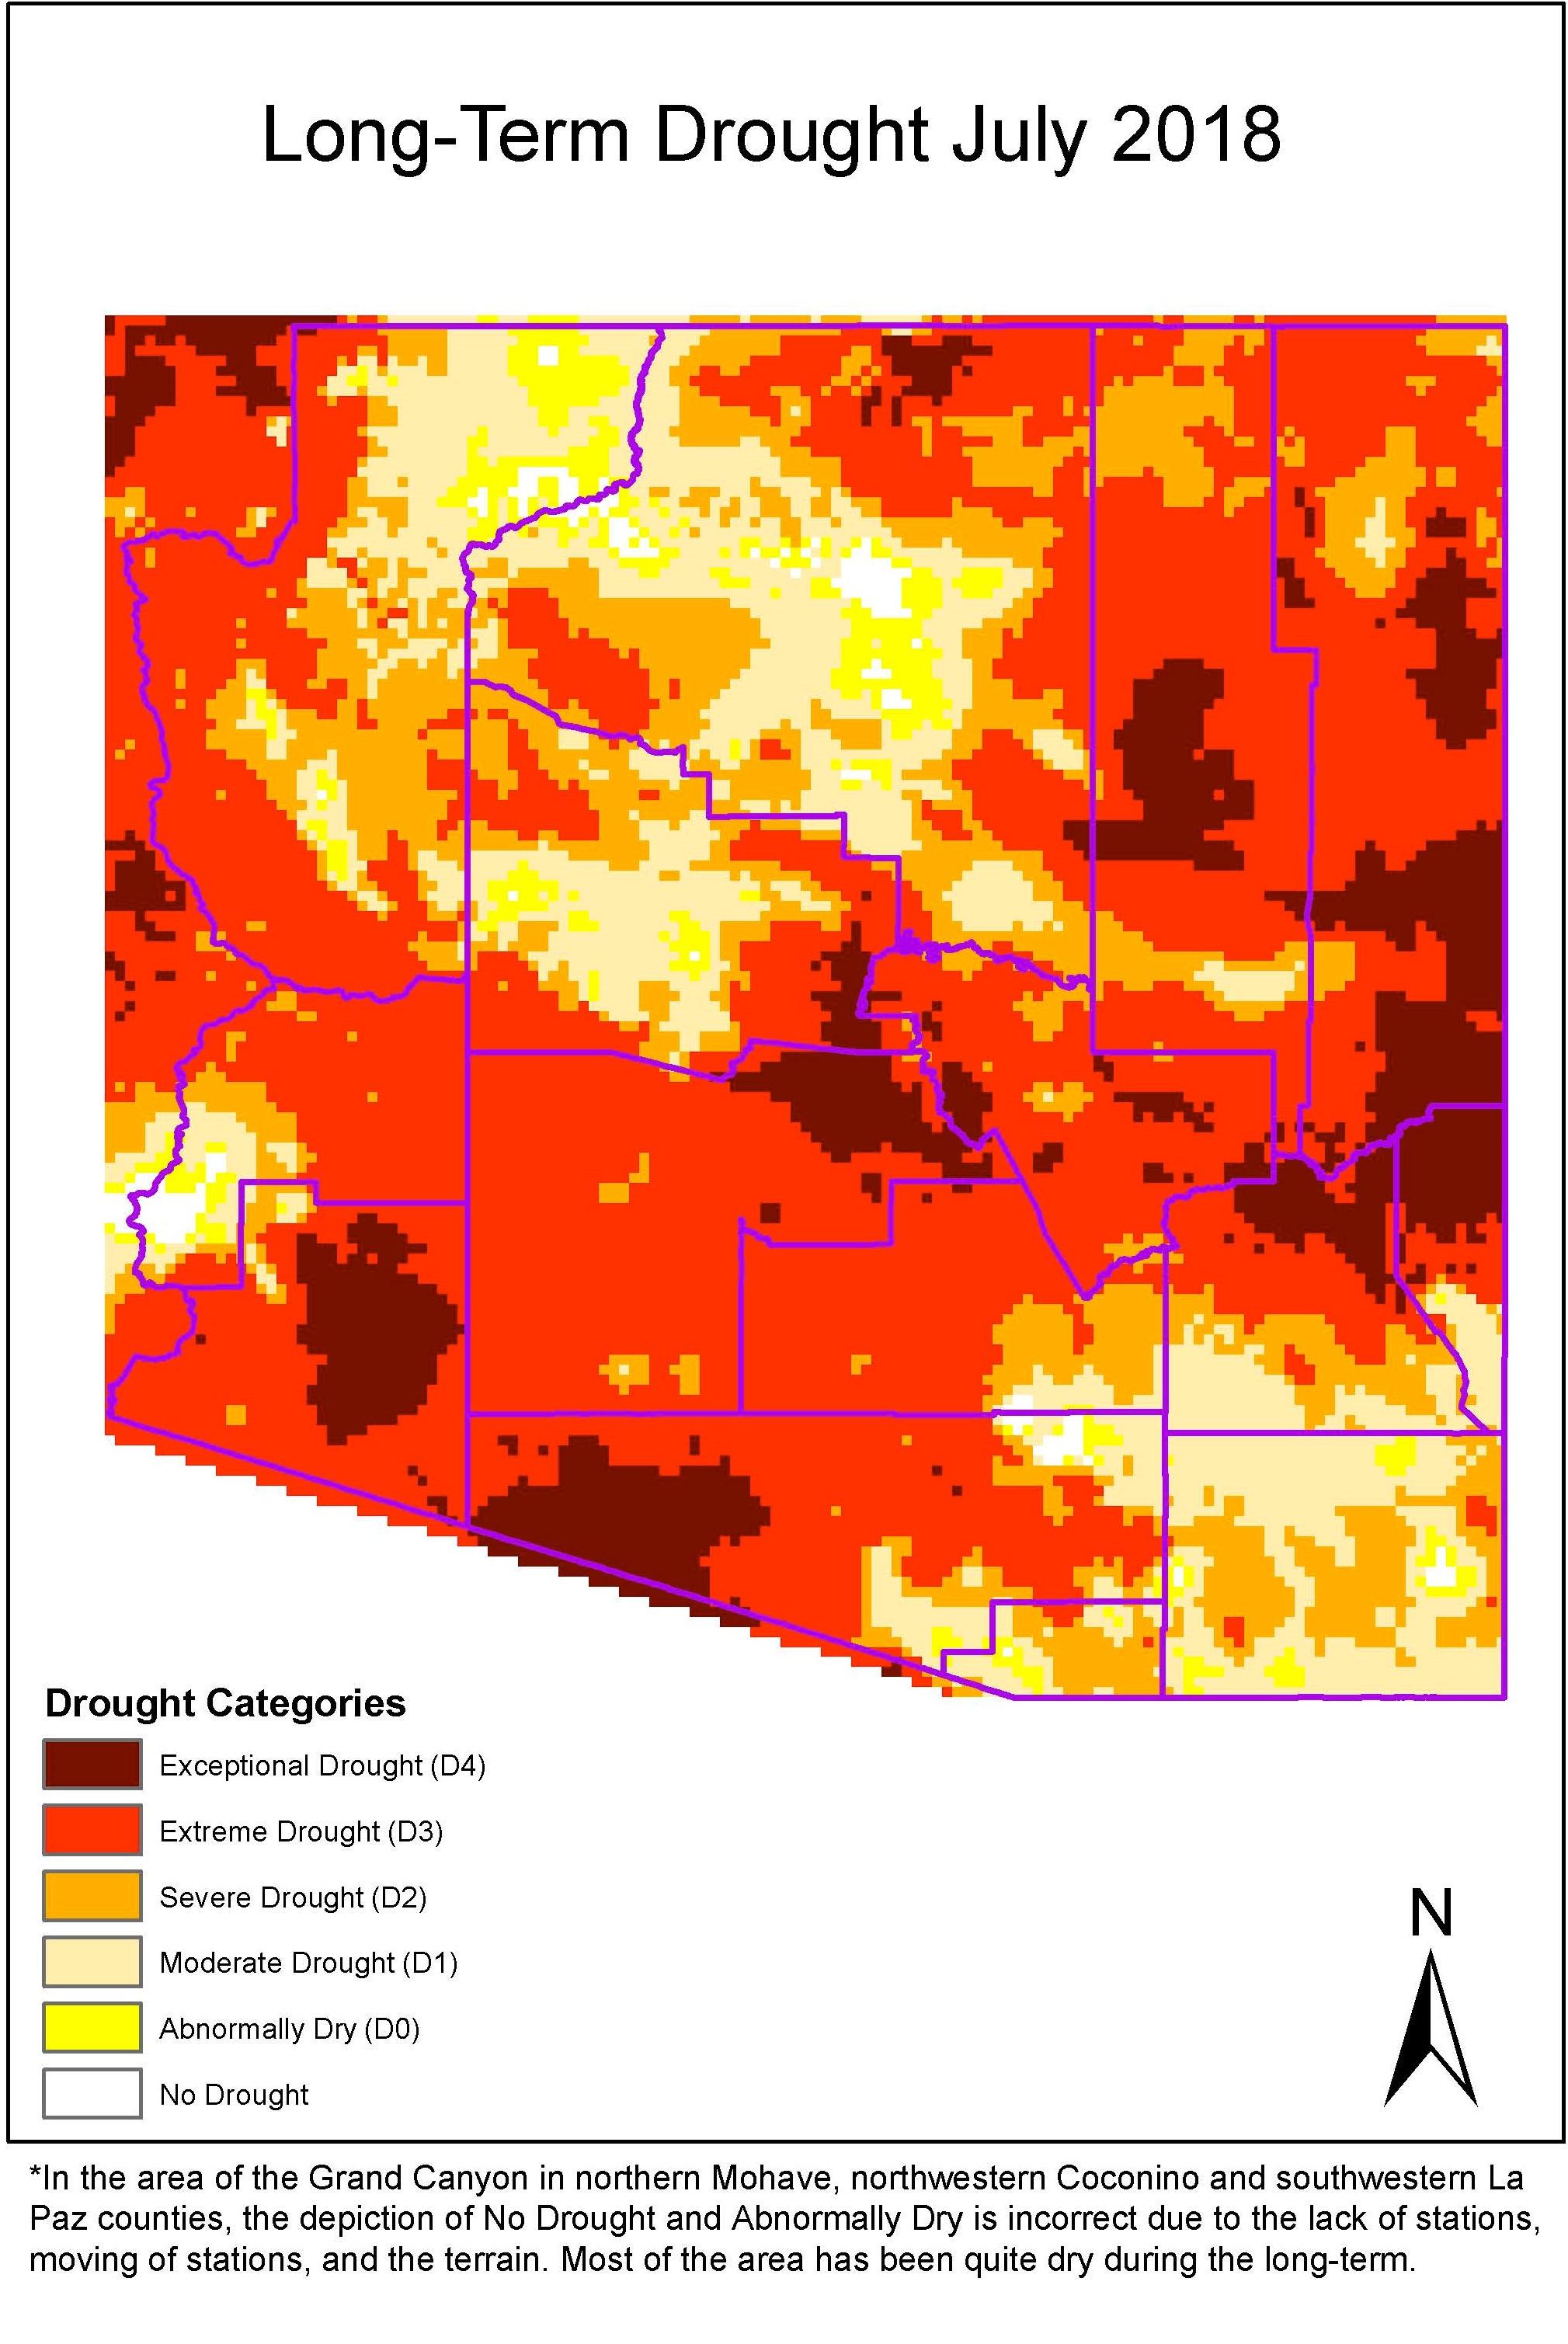 Long-Term Drought July 2018 rev. w text.jpg